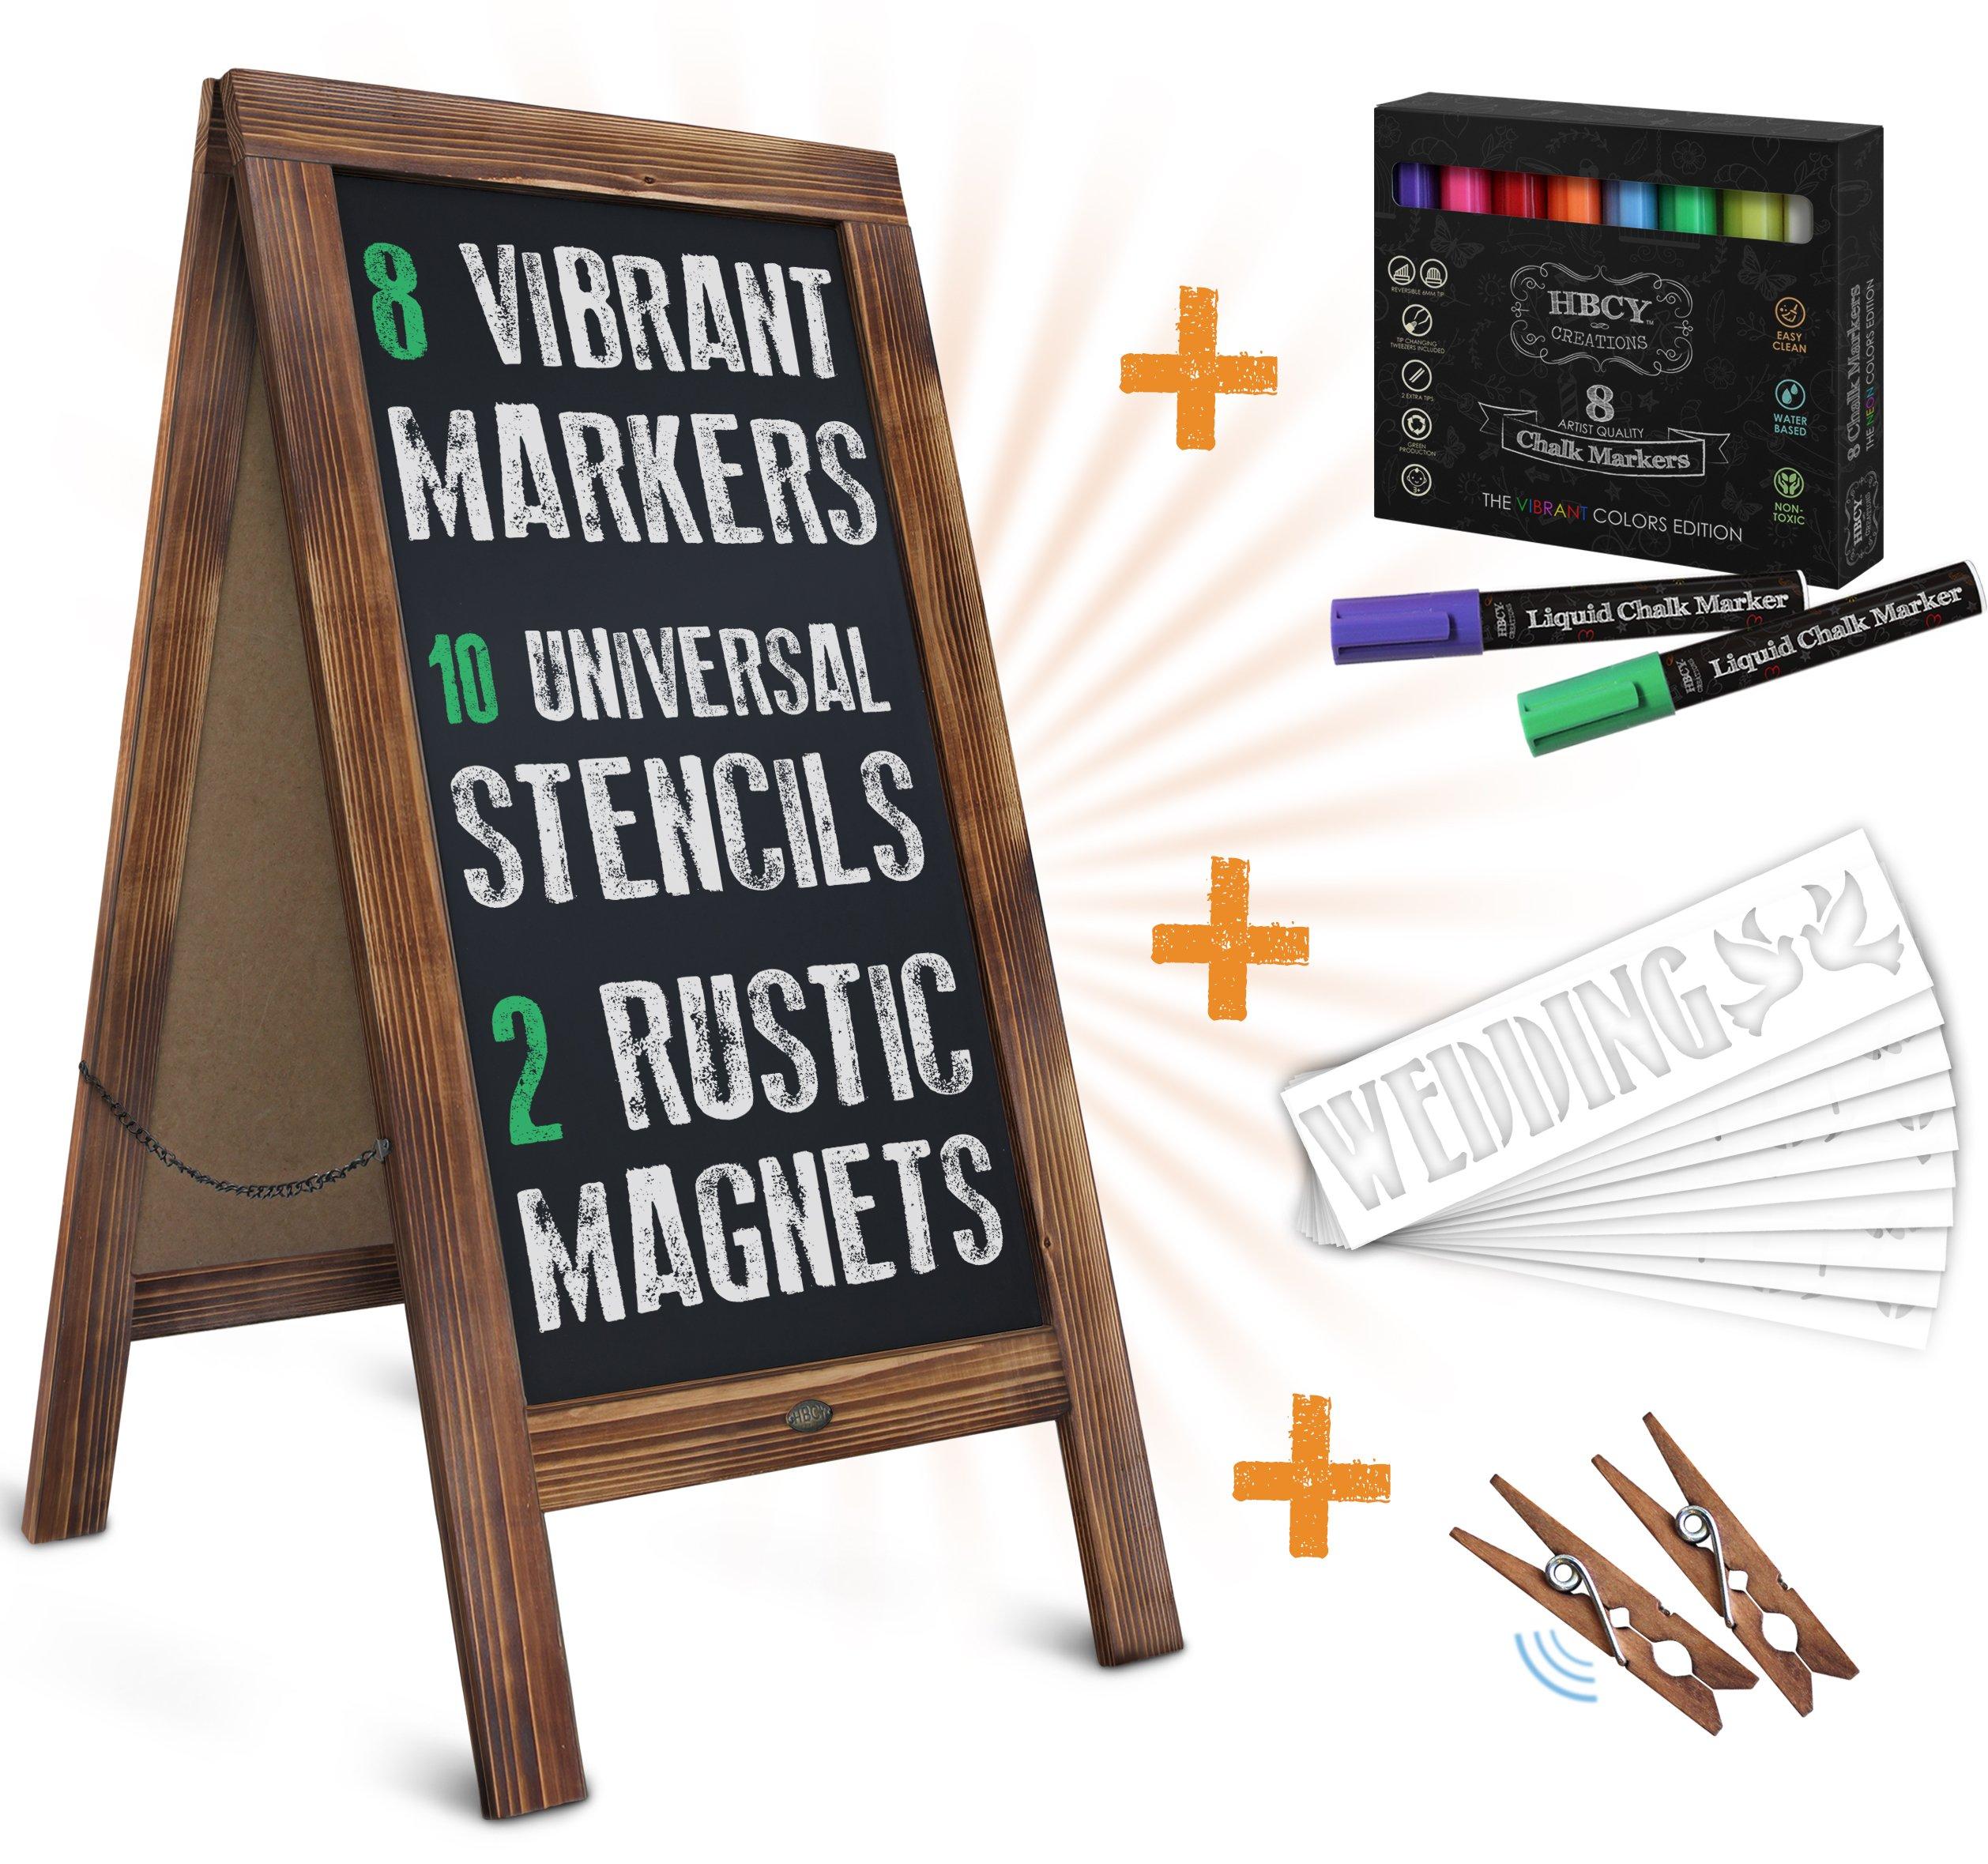 Rustic Magnetic A-Frame Chalkboard Deluxe Set / 8 Chalk Markers + 10 Stencils + 2 Magnets! Outdoor Sidewalk Chalkboard Sign/Large 40'' x 20'' Sturdy Sandwich Board (The Deluxe Set)